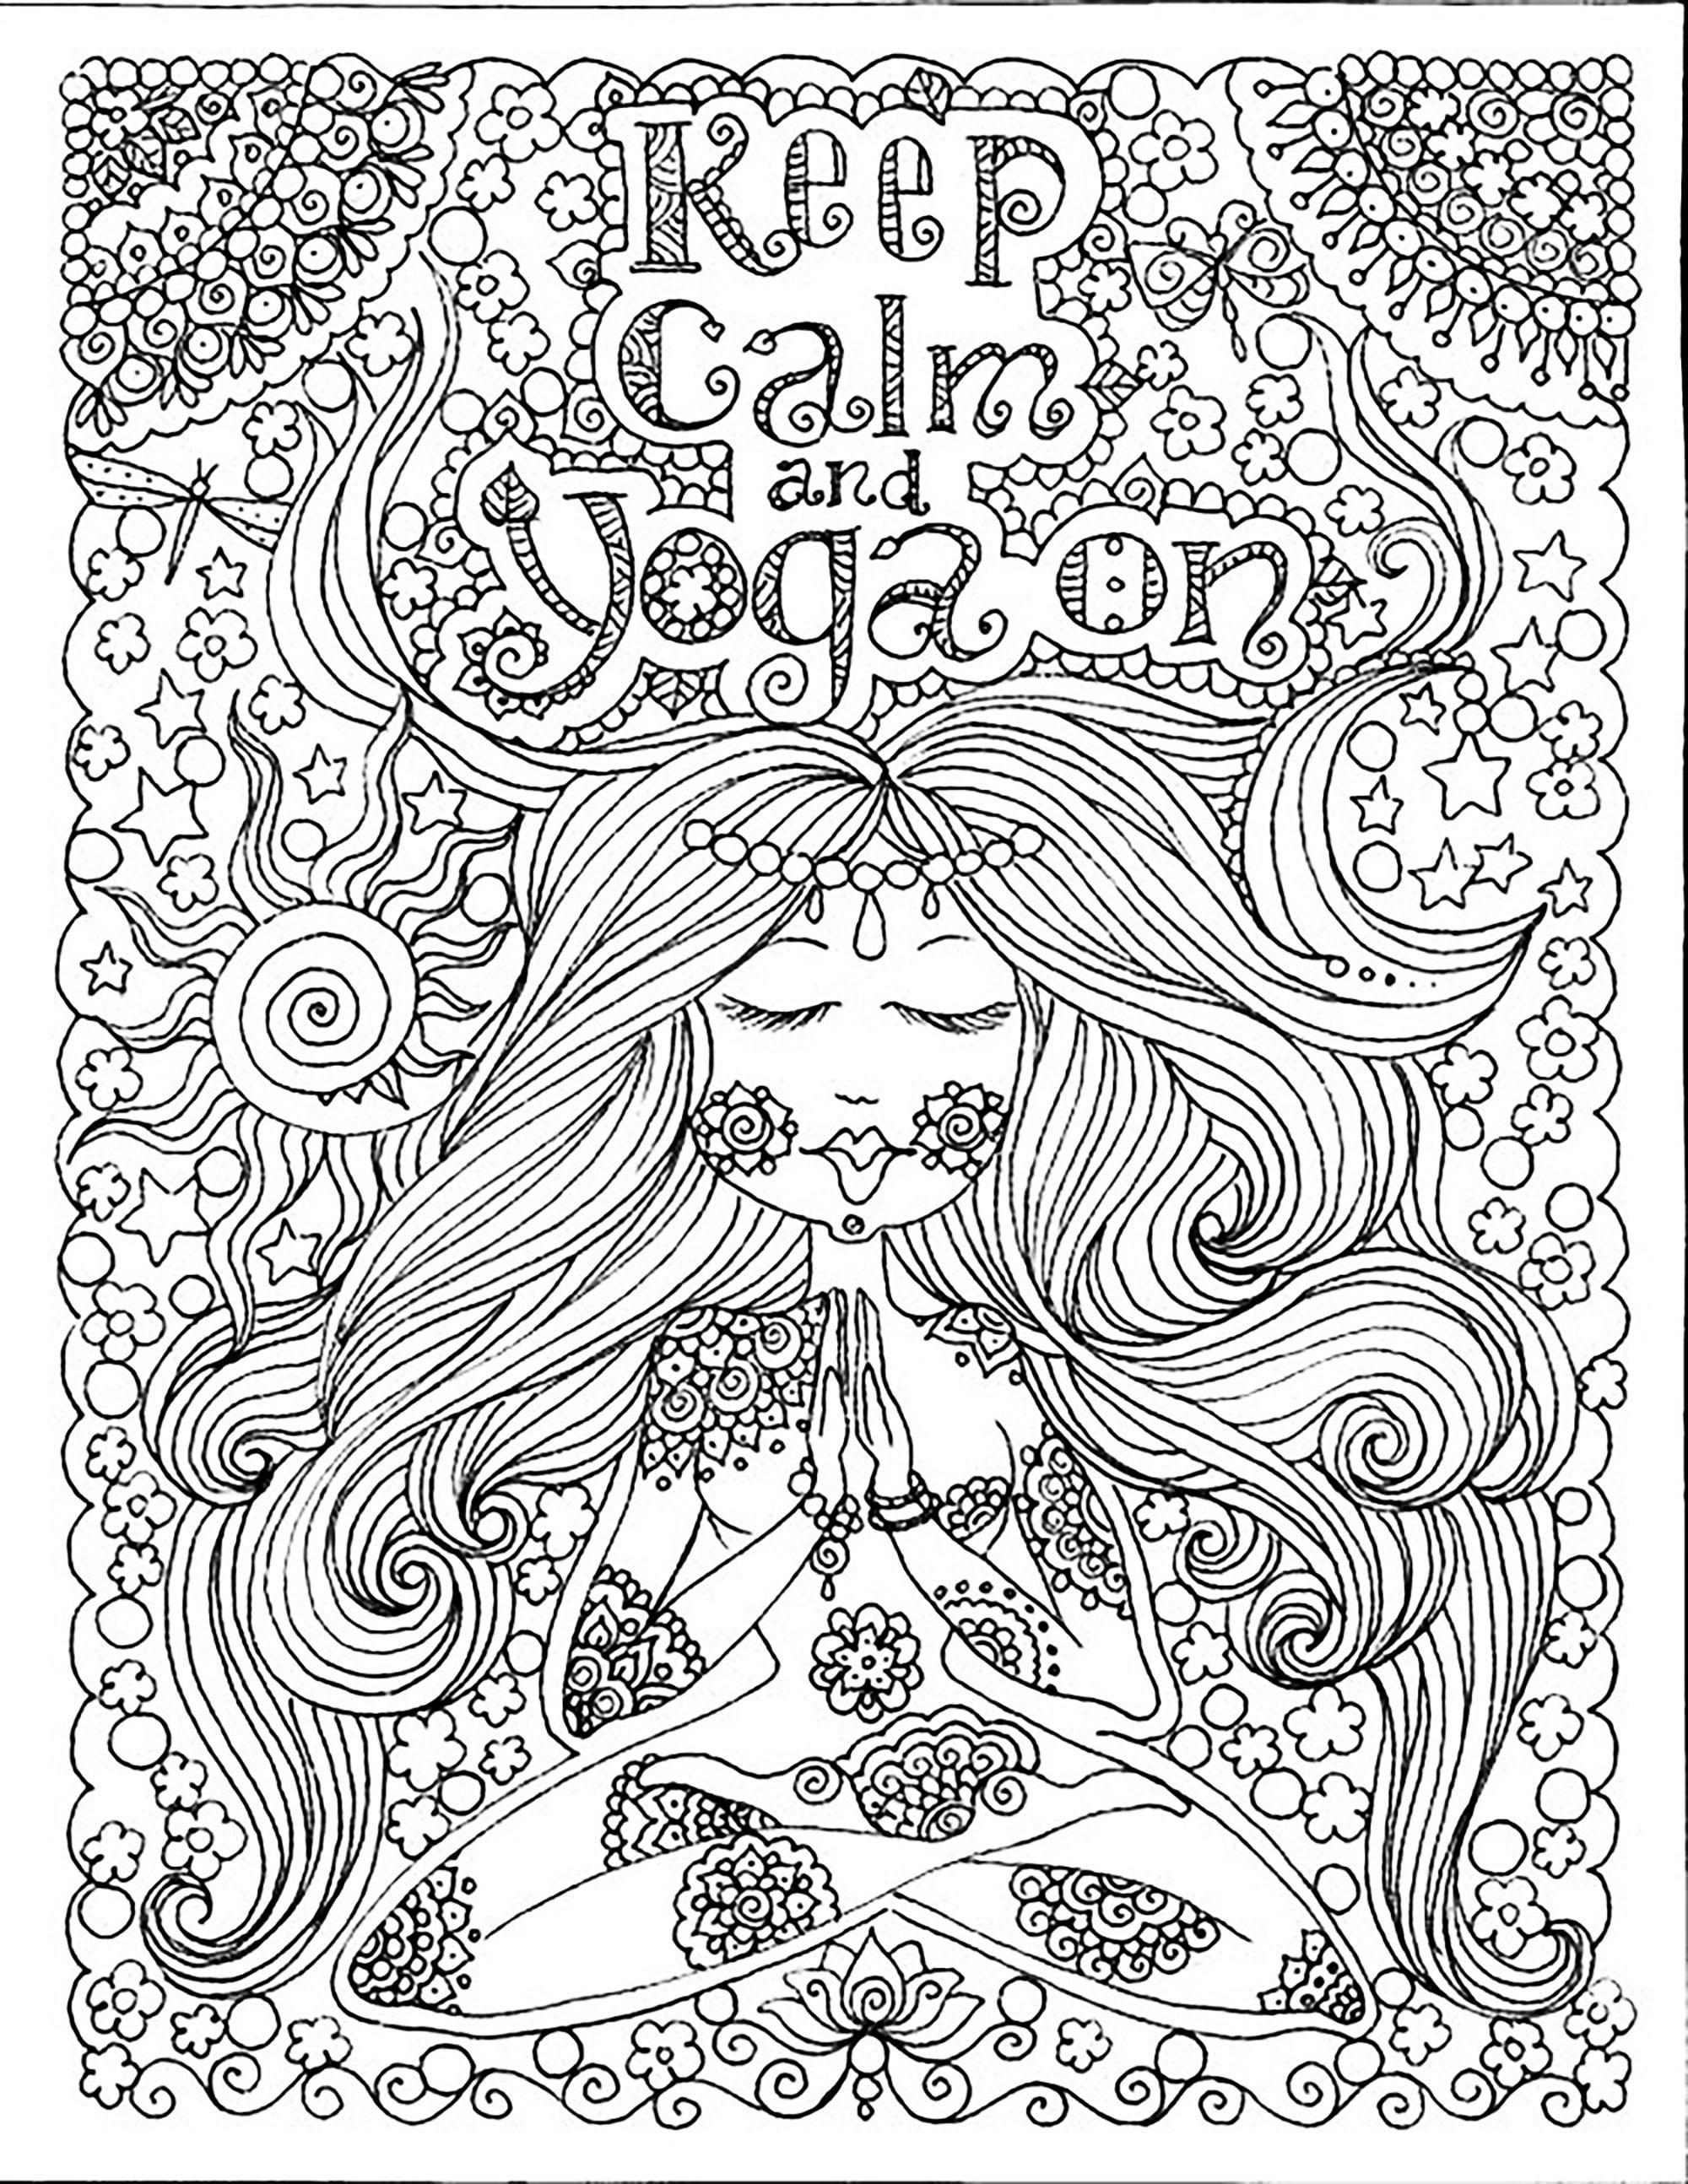 Keep Calm And Do Yoga By Deborah Muller Zen And Anti Stress